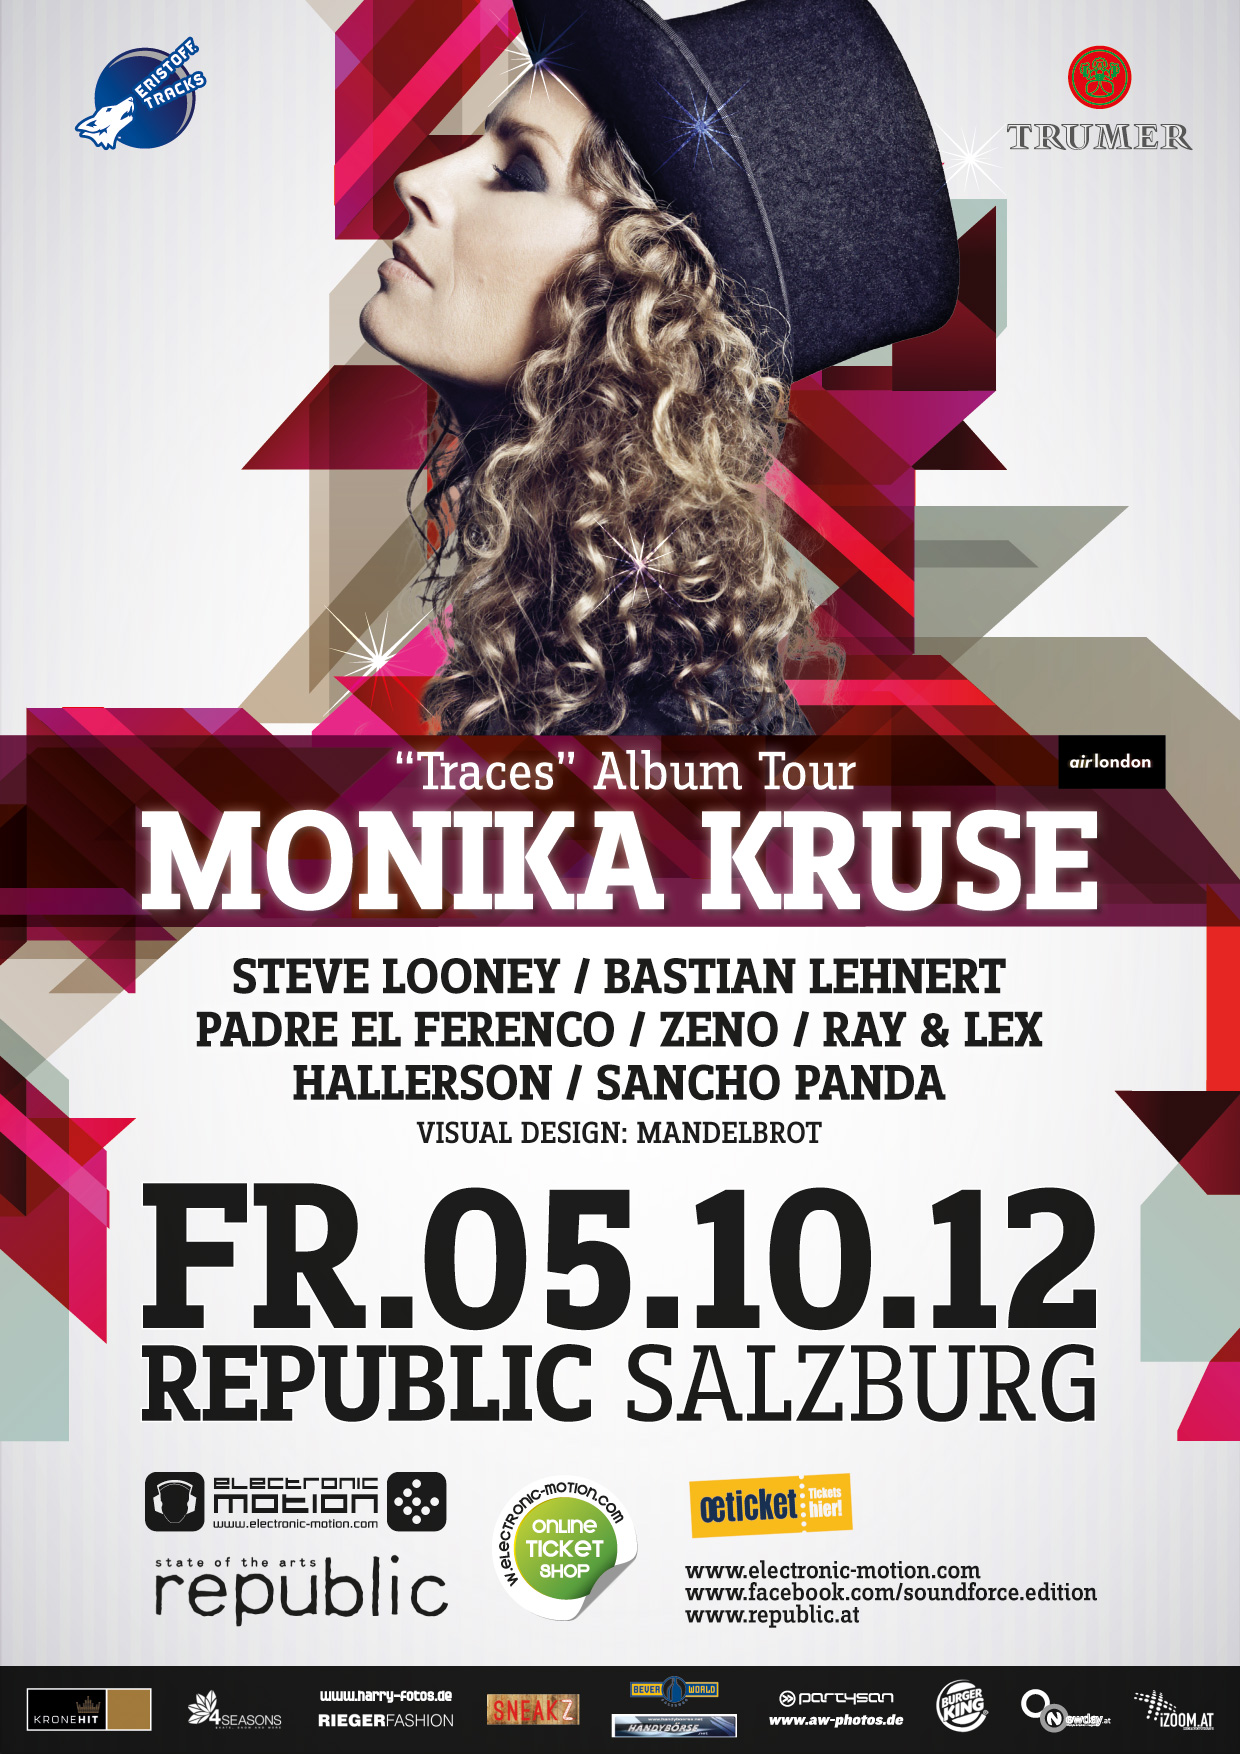 SOUNDFORCE -diamond edition- with Monika Kruse, 05.10.2012 @ Republic Salzburg